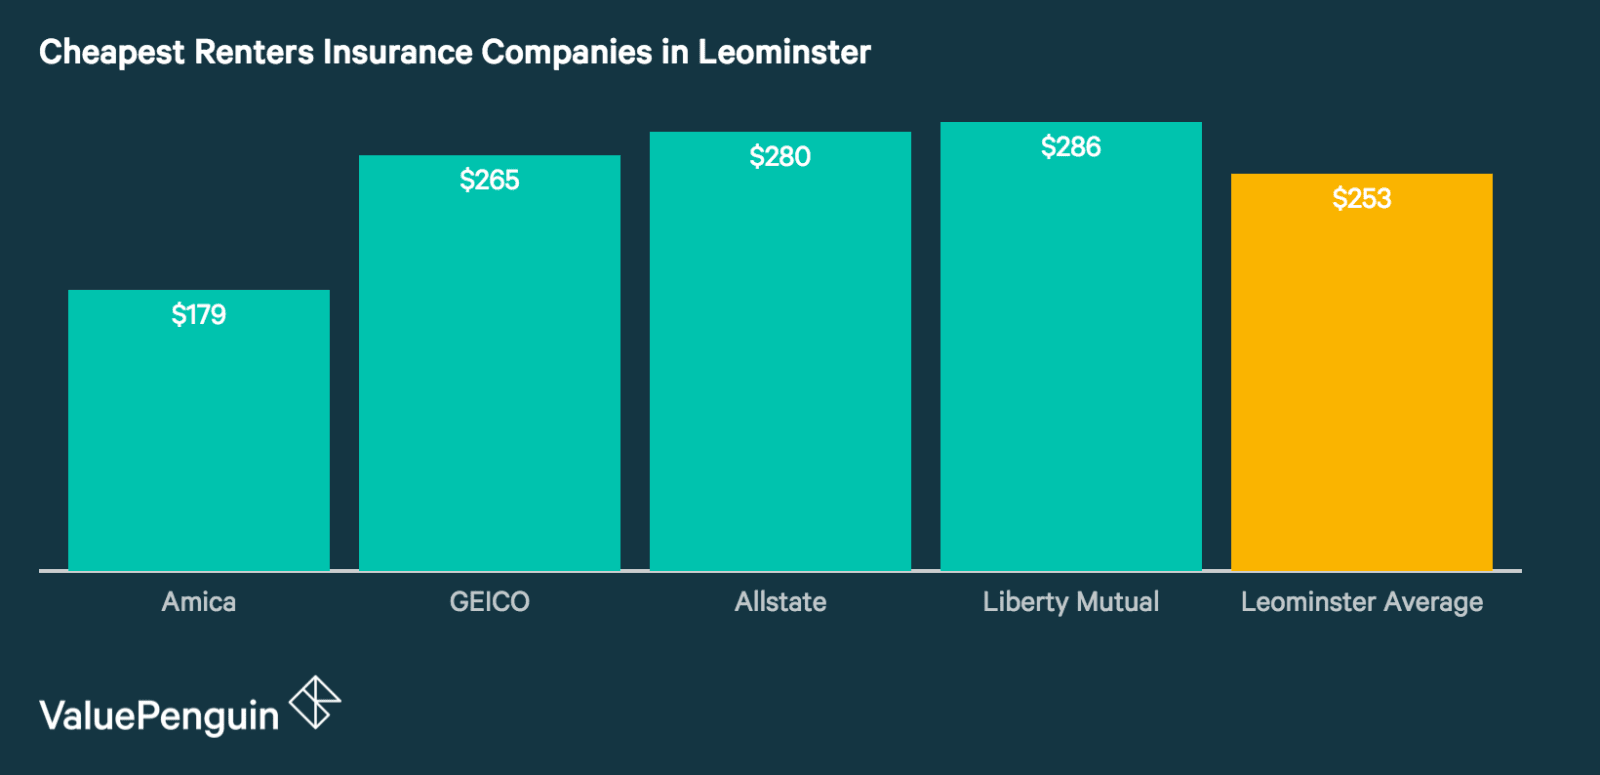 Best Renters Insurance Companies in Leominster